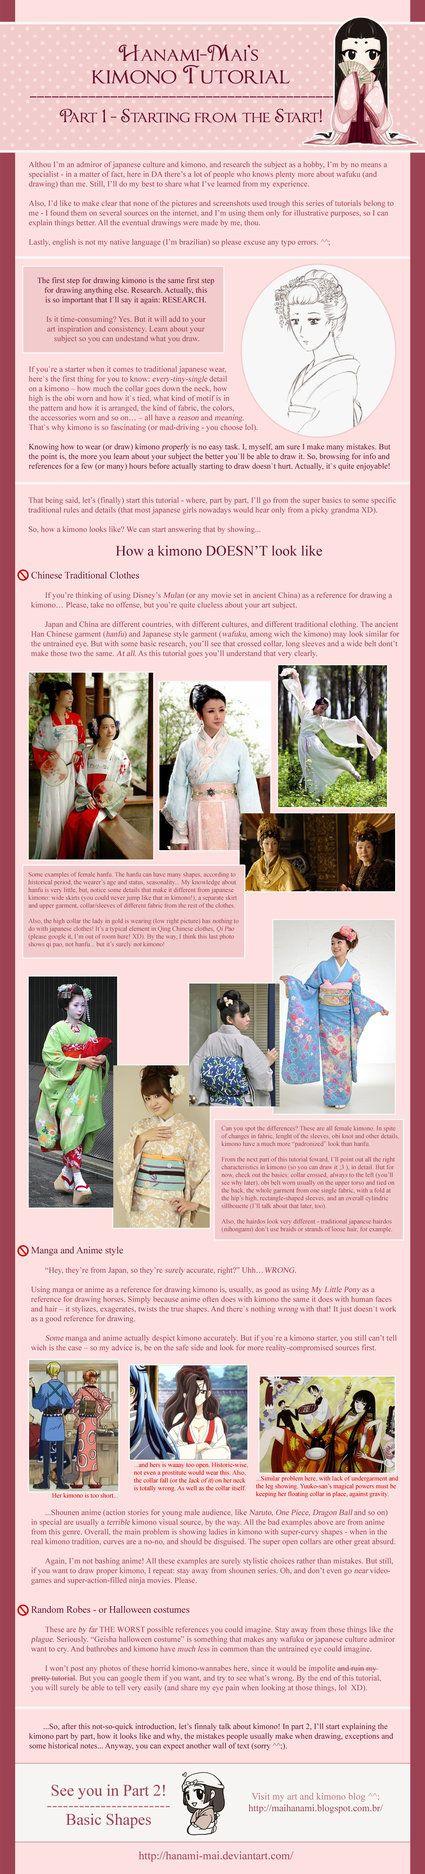 Kimono Tutorial - Part 01 by Hanami-Mai.deviantart.com on @DeviantArt